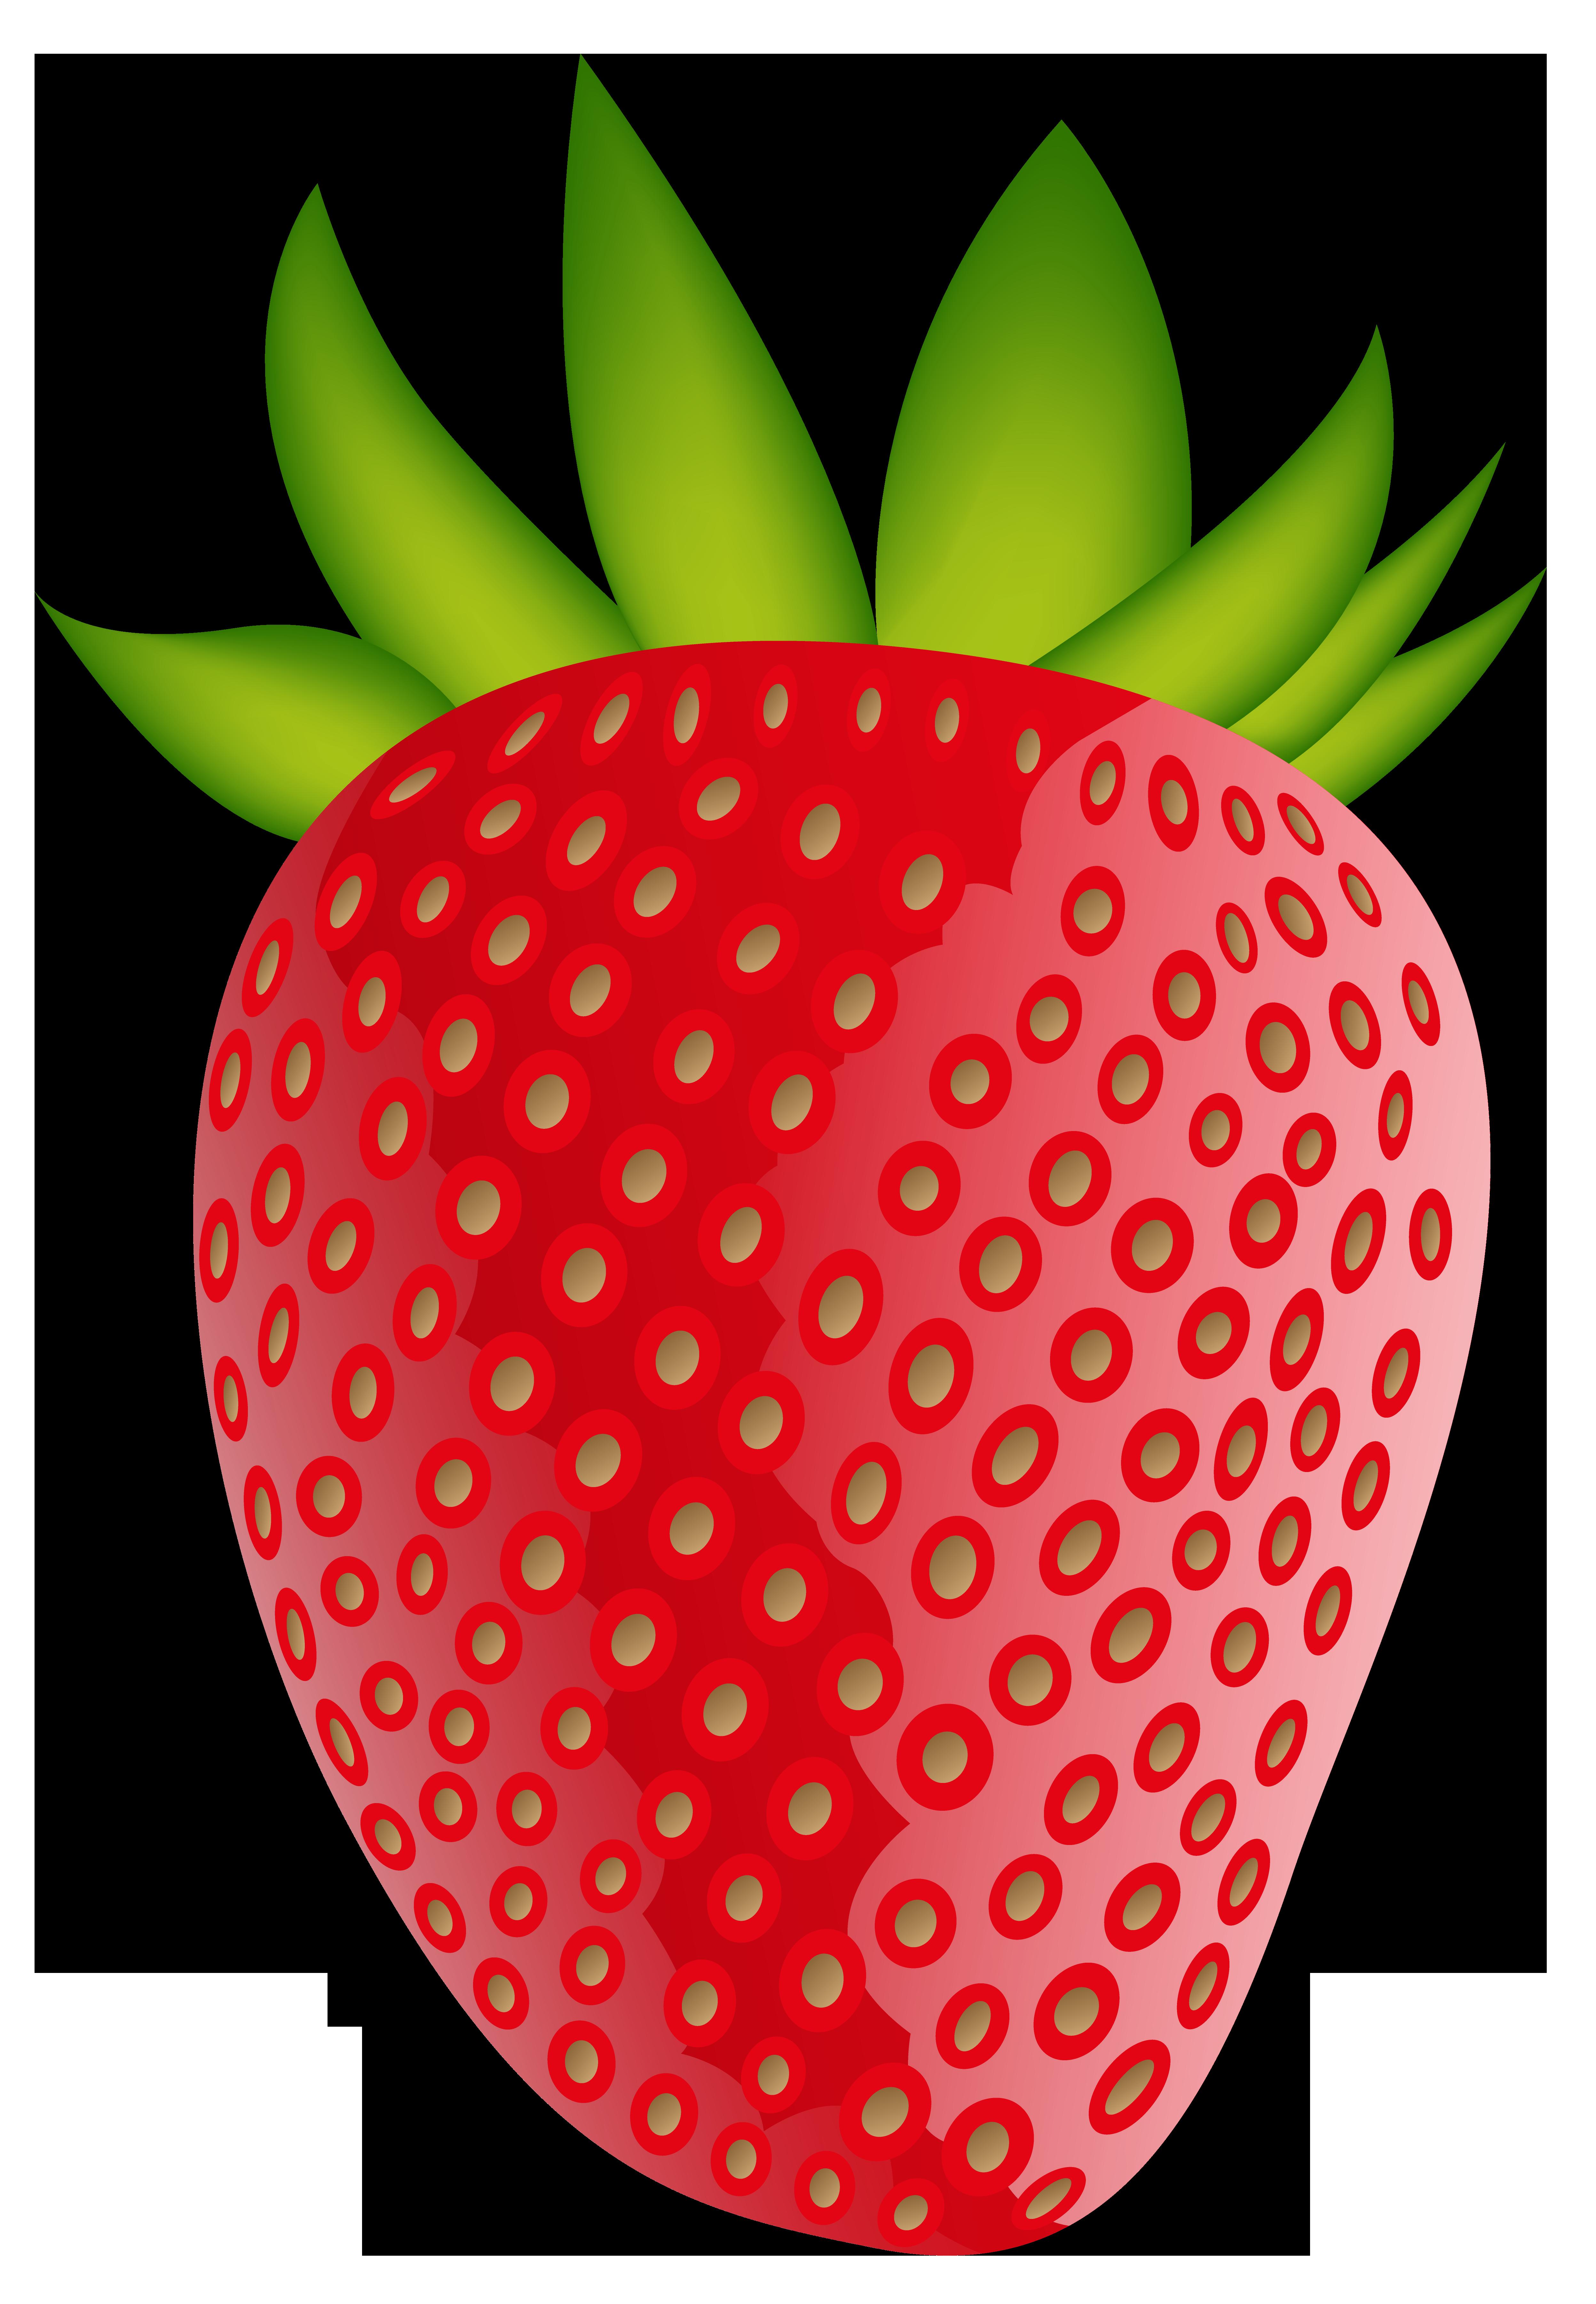 Strawberry clipart 5.